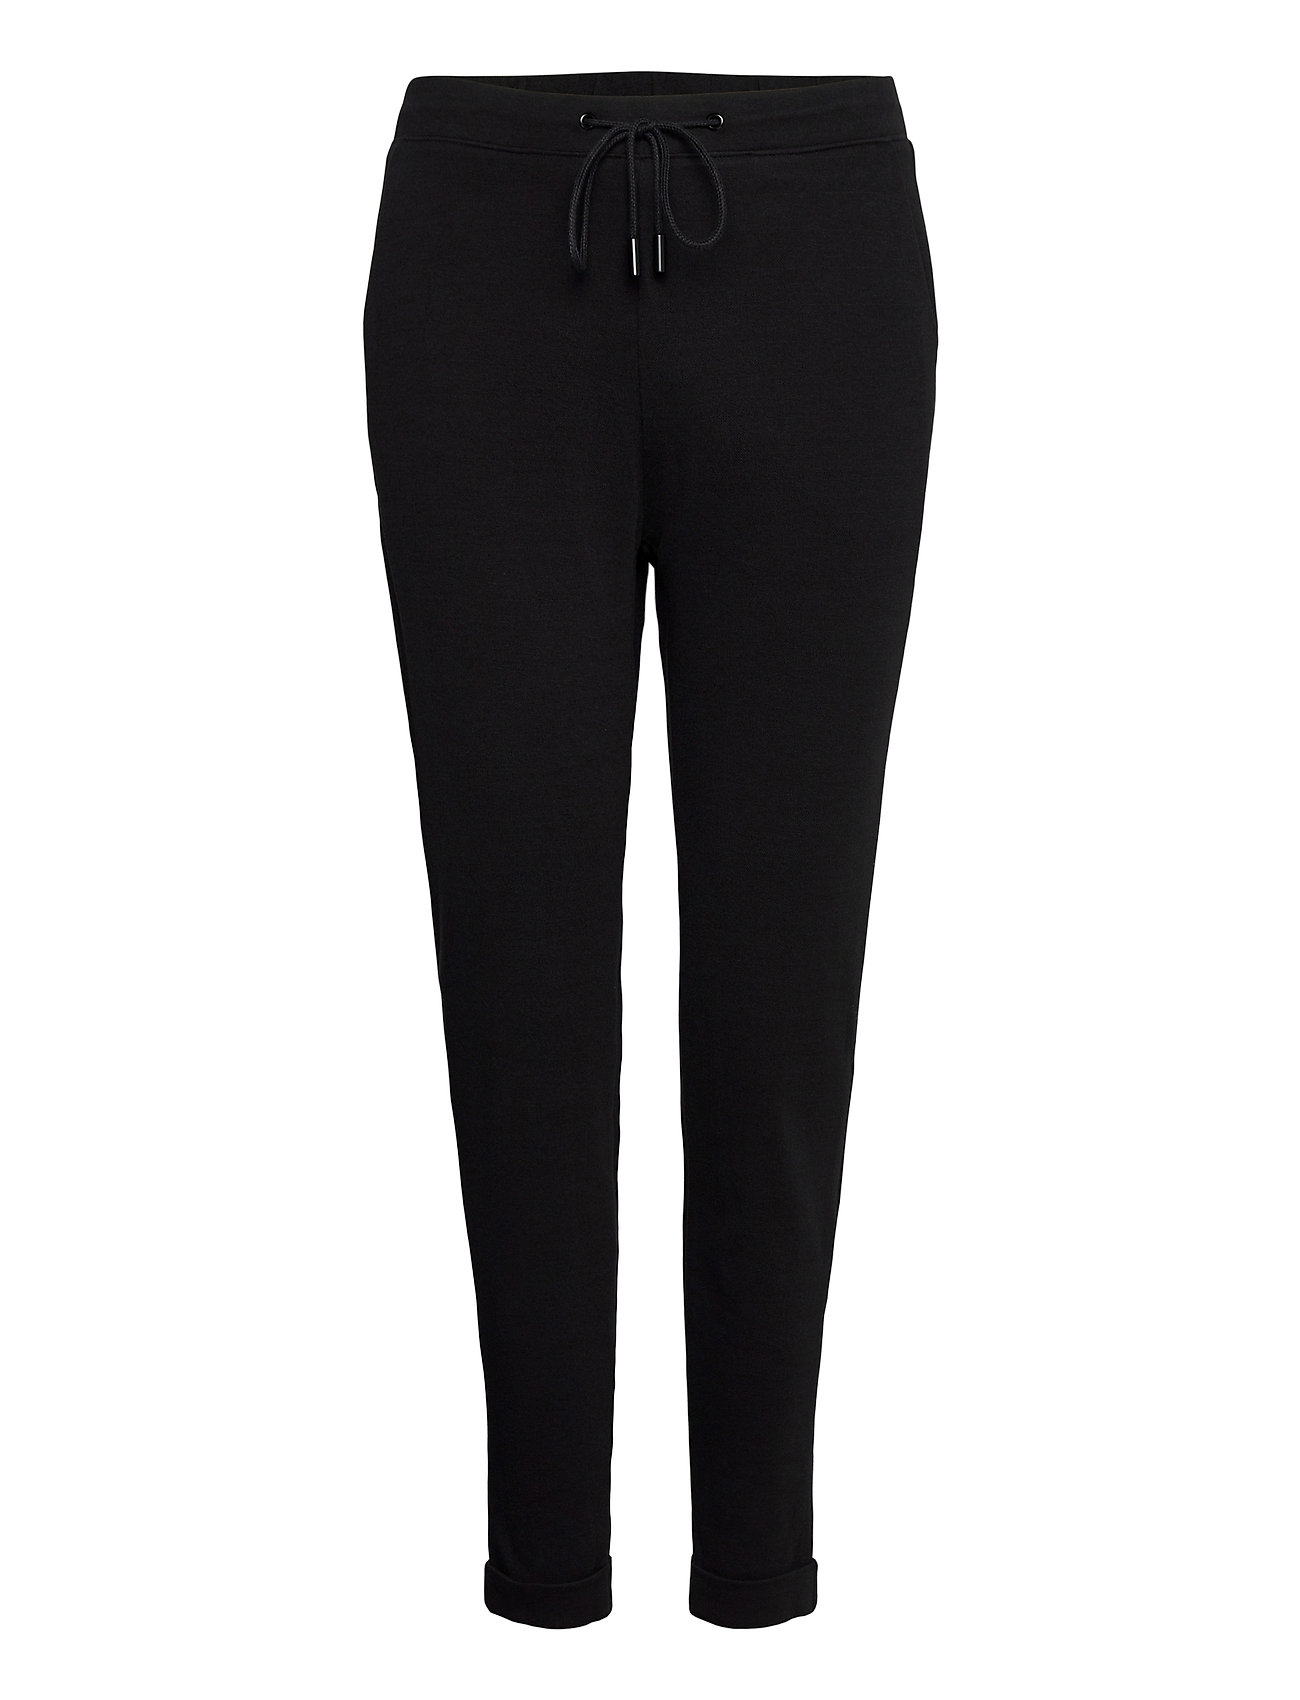 Image of Pants Woven Casual Bukser Sort Esprit Casual (3452218403)